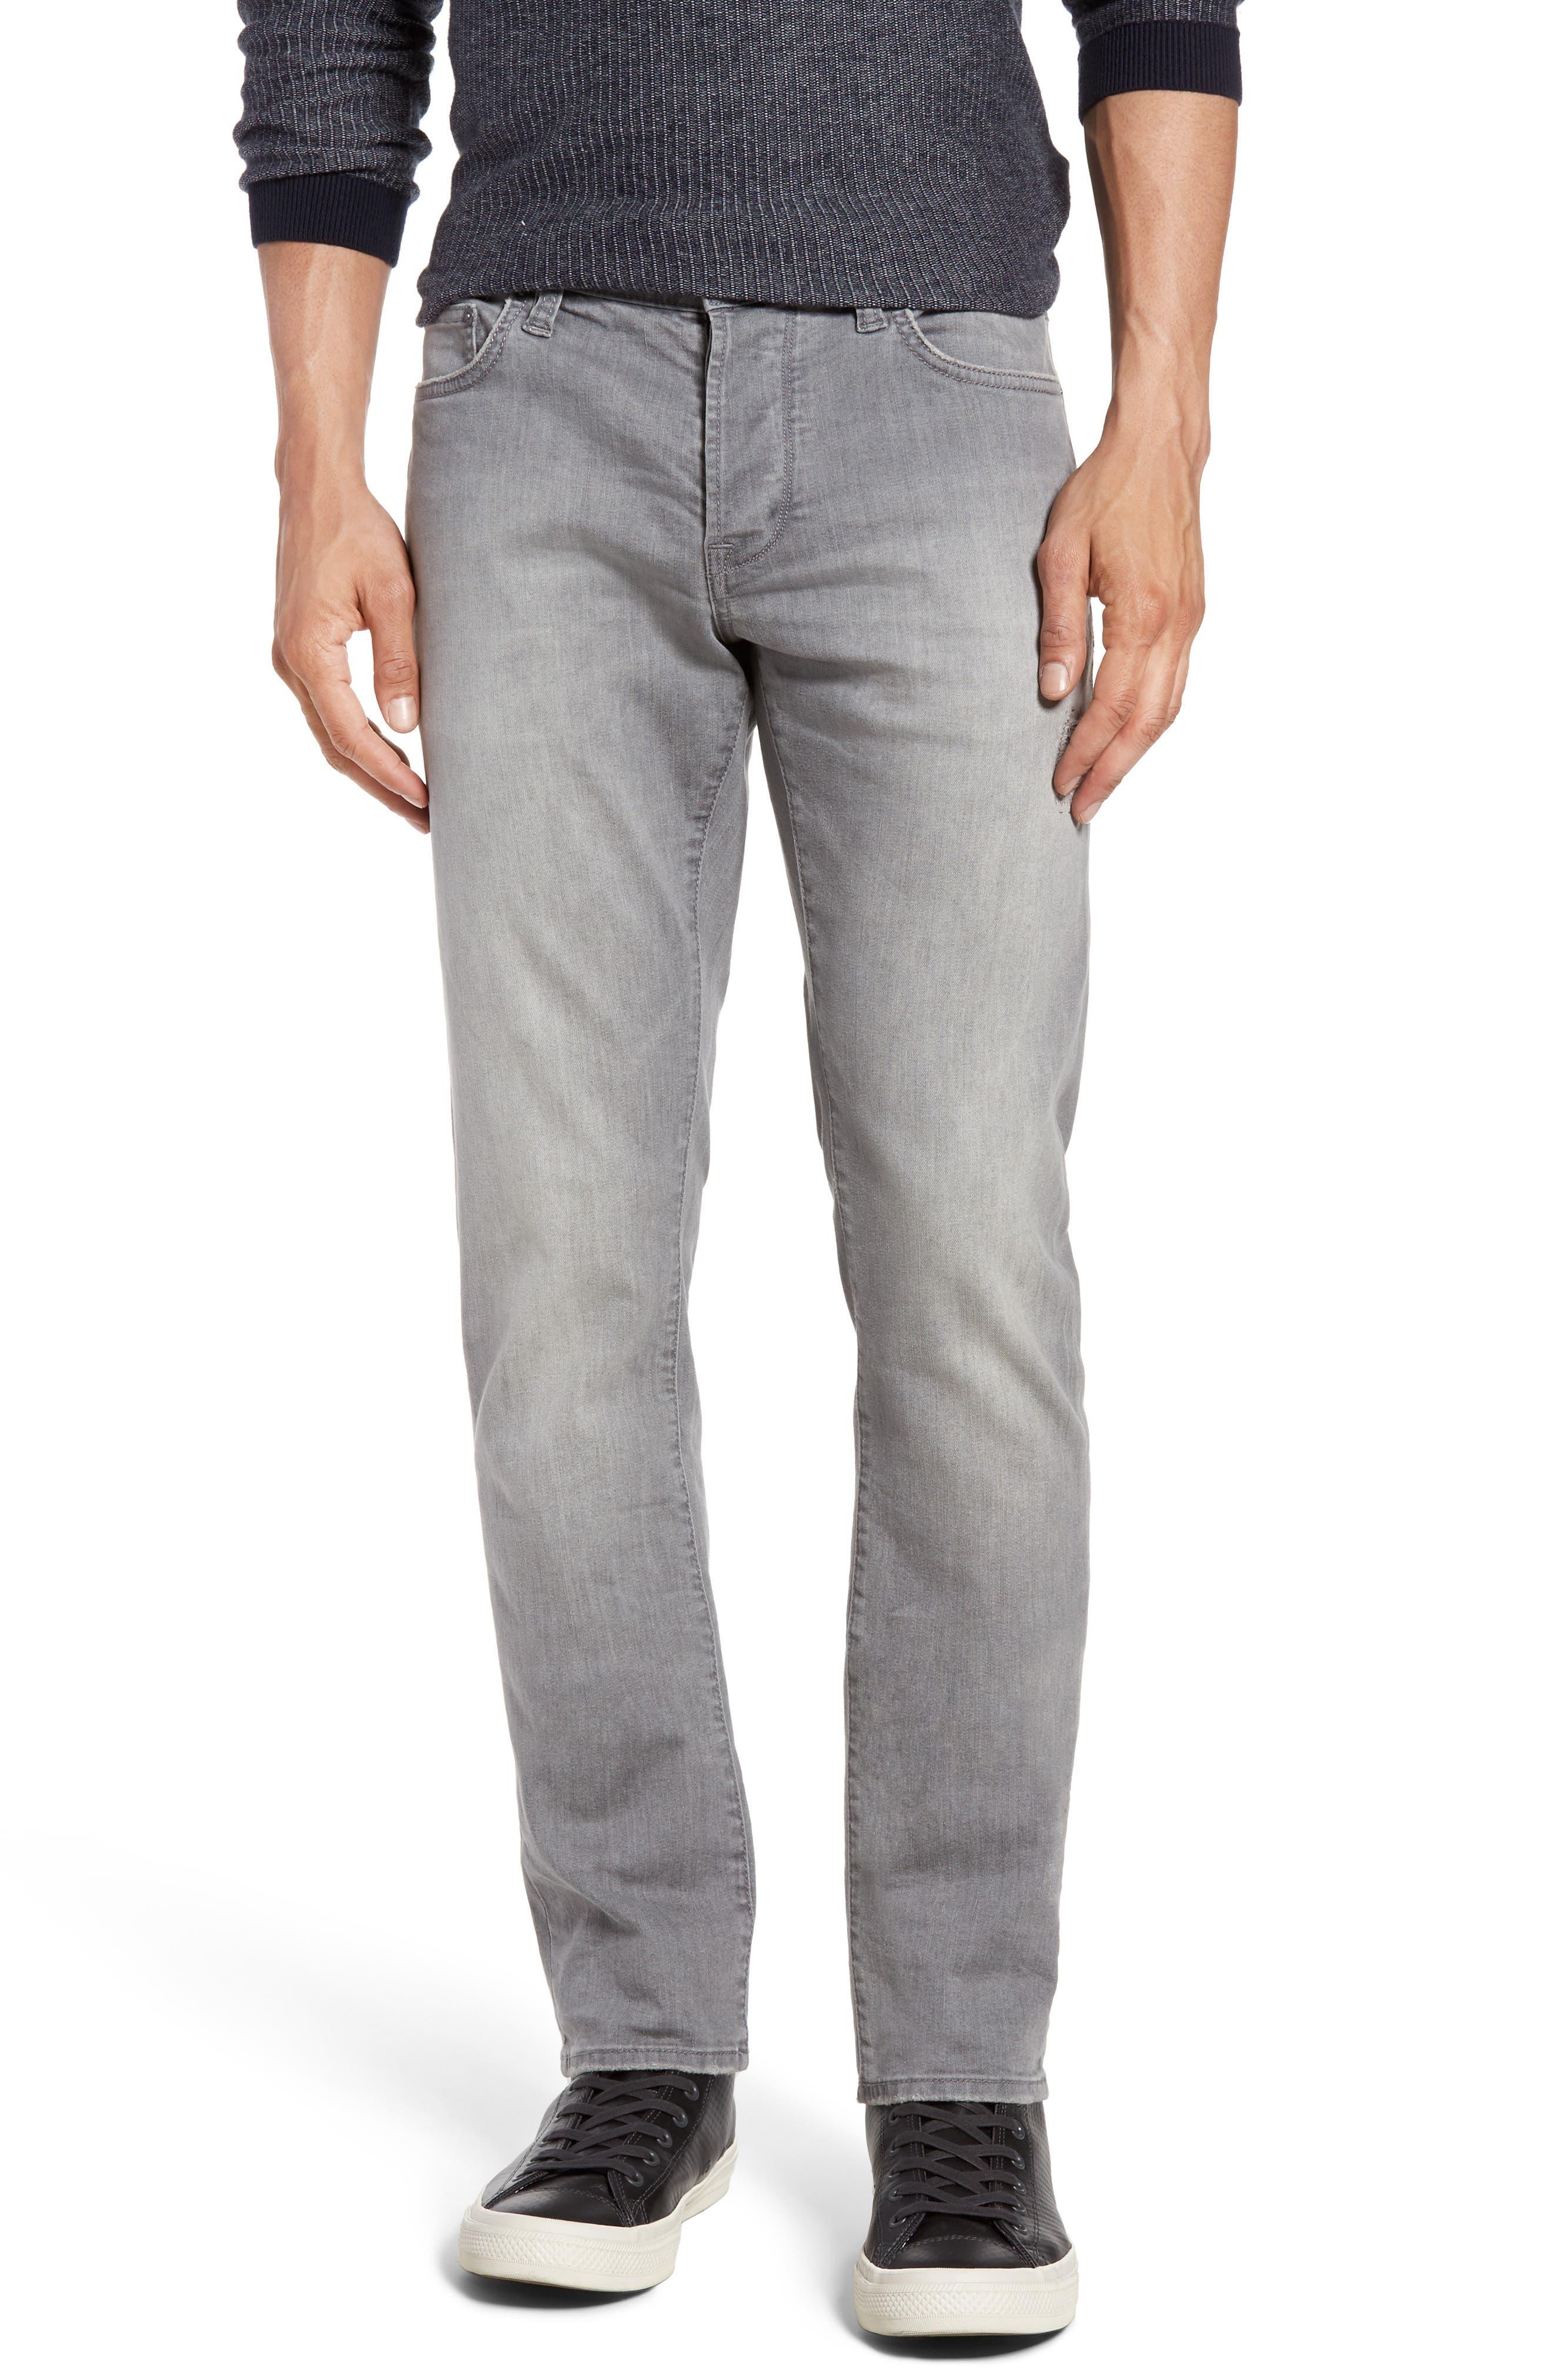 Wight Skinny Jeans,                             Main thumbnail 1, color,                             Medium Grey